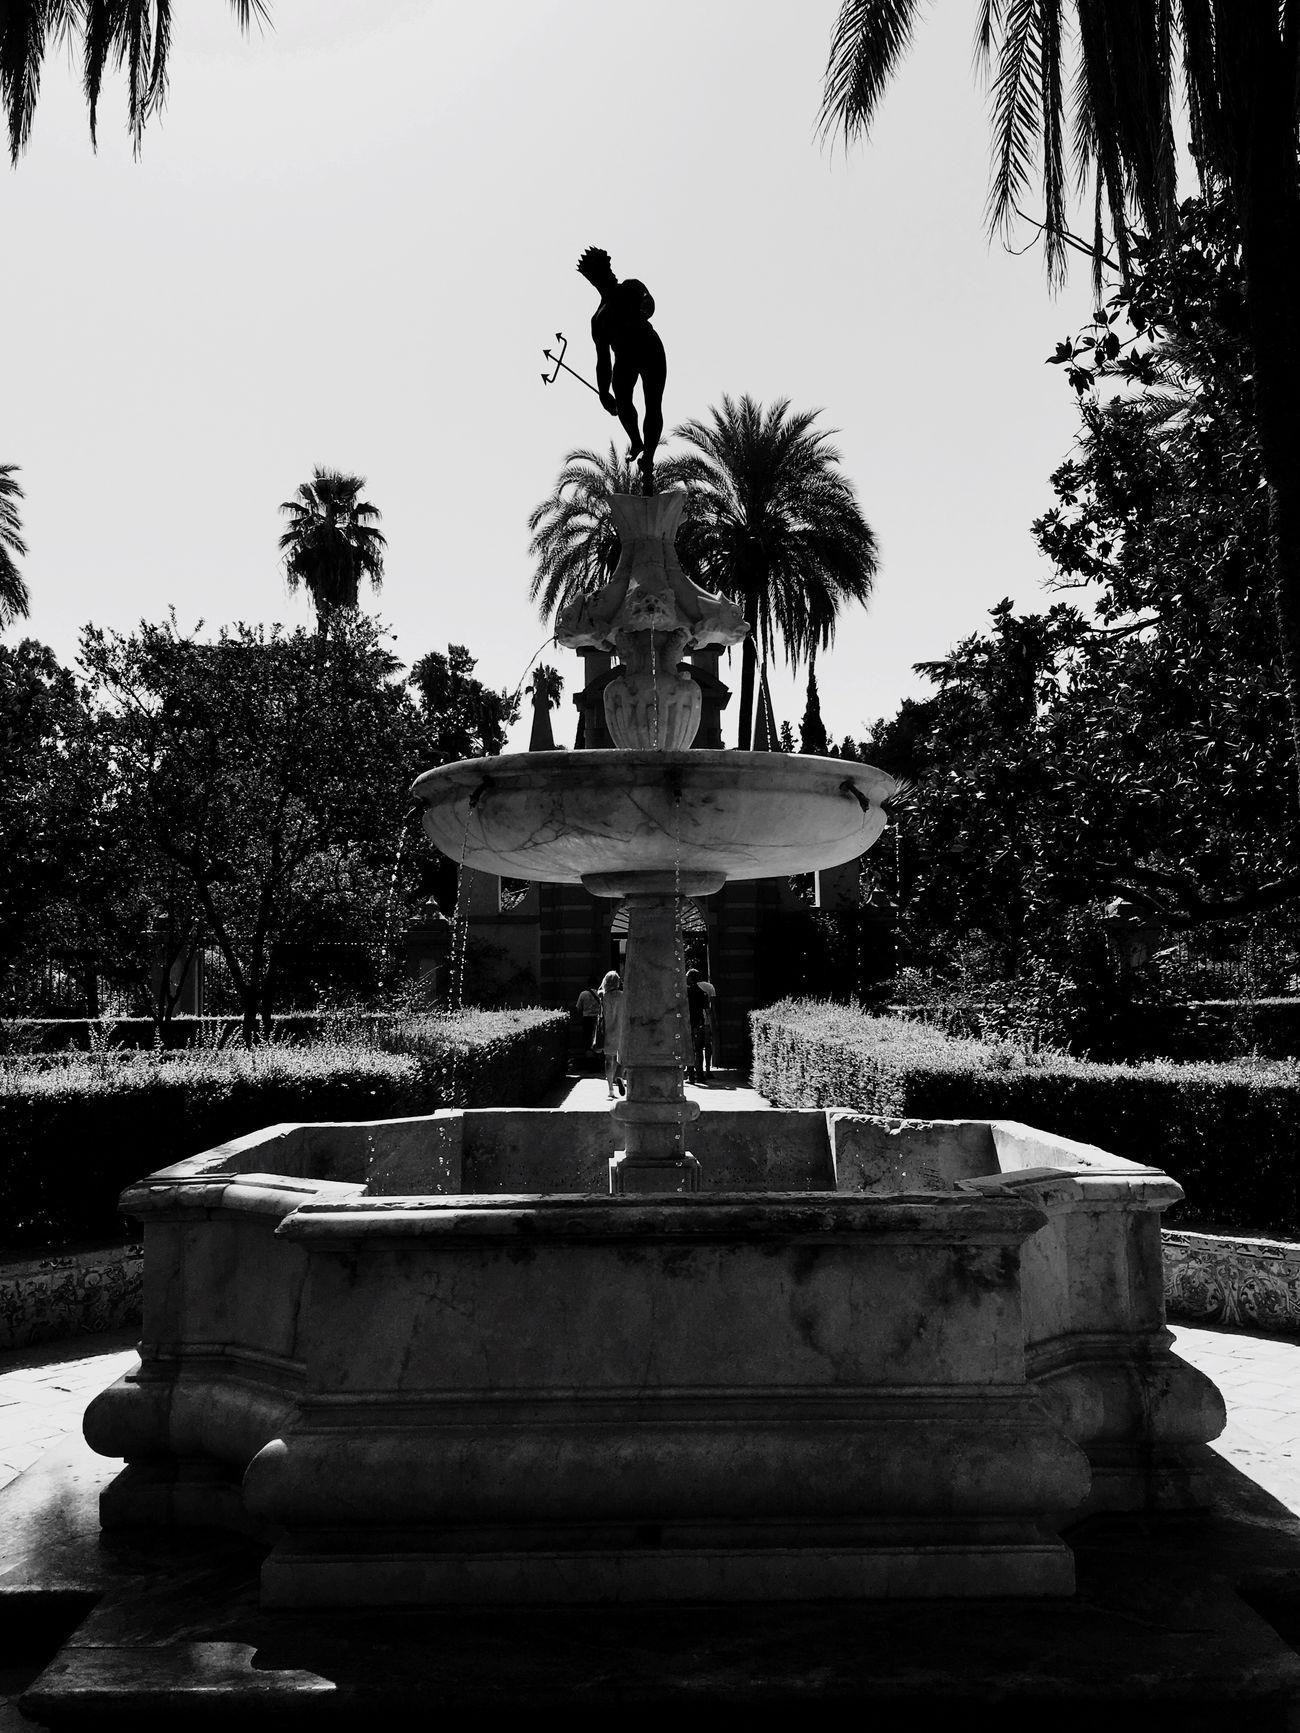 Sculpture Statue Taking Photos IPhoneography Alcazar